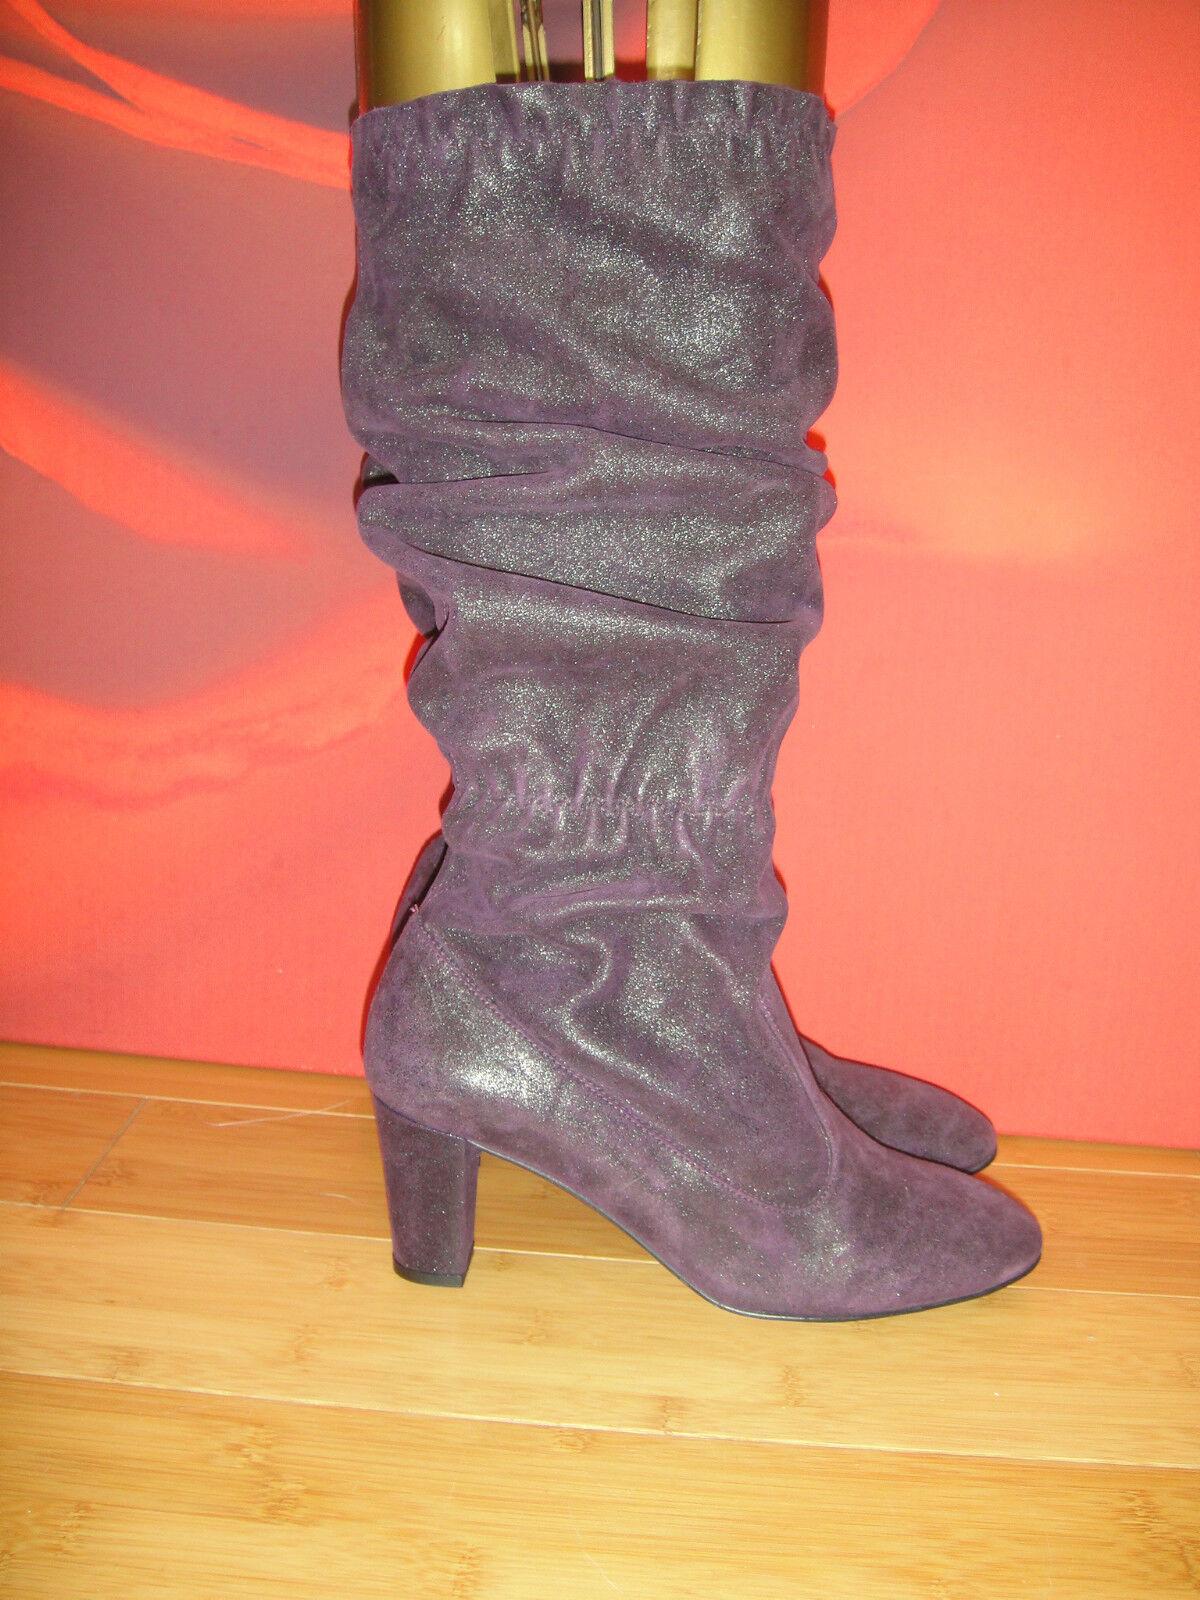 Superb ACCESSOIRE DIFFUSION lila shiny leather  slouch  Stiefel EU 36  59